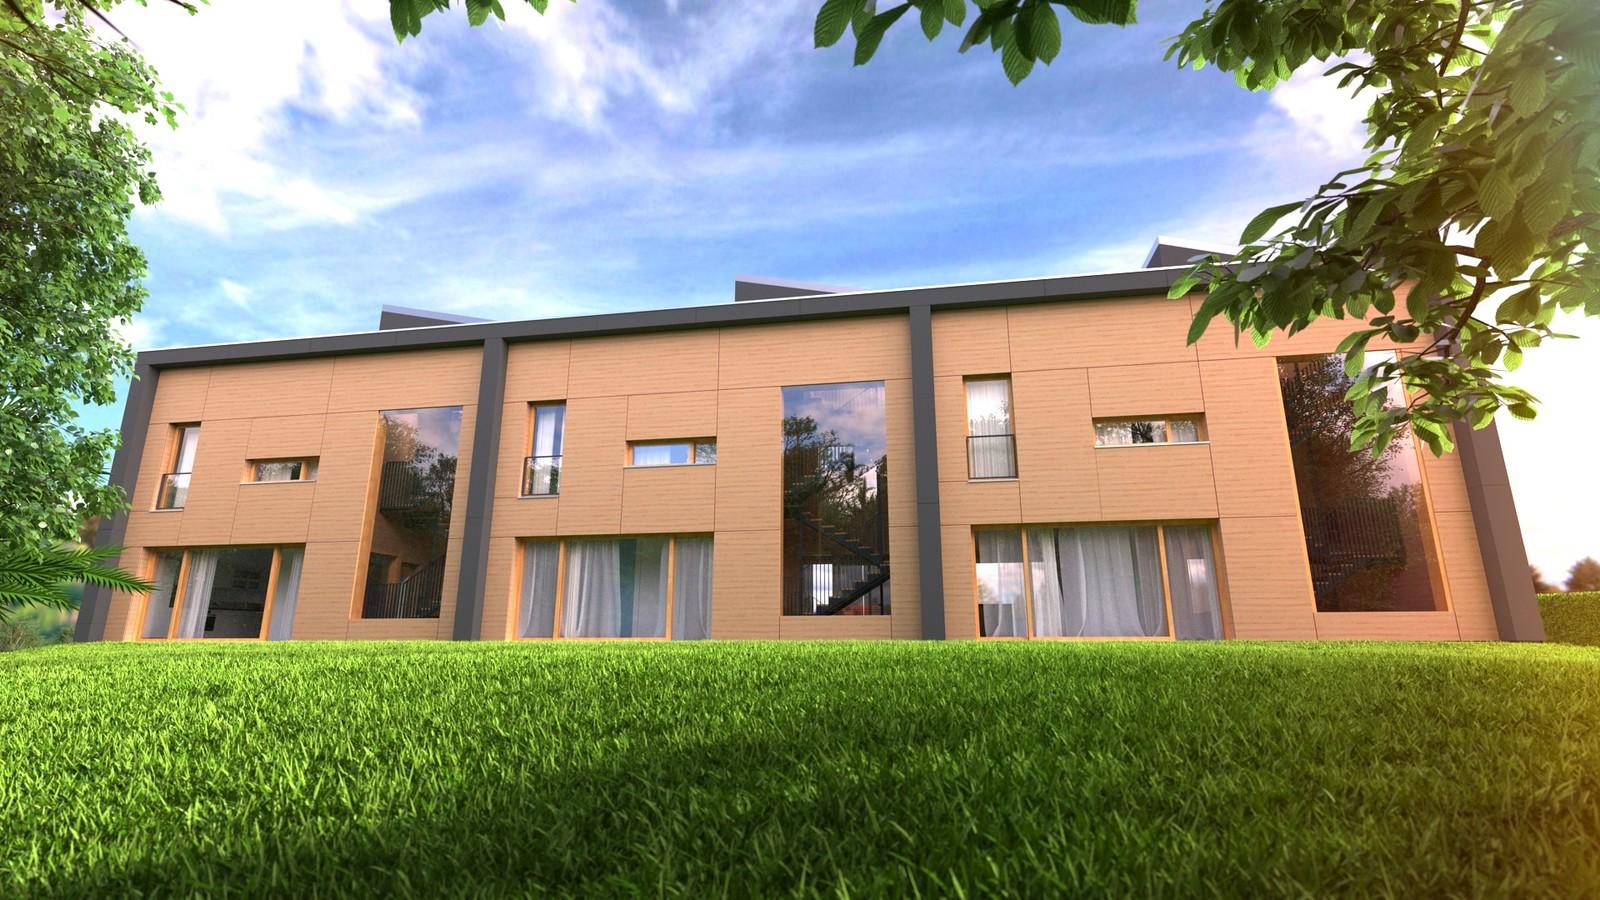 31 Exterior N ground level 04 Orange 40  KP webpage of project: http://www.kemppro.com/KP_3D_communication_3_Villas_Veyrier.html